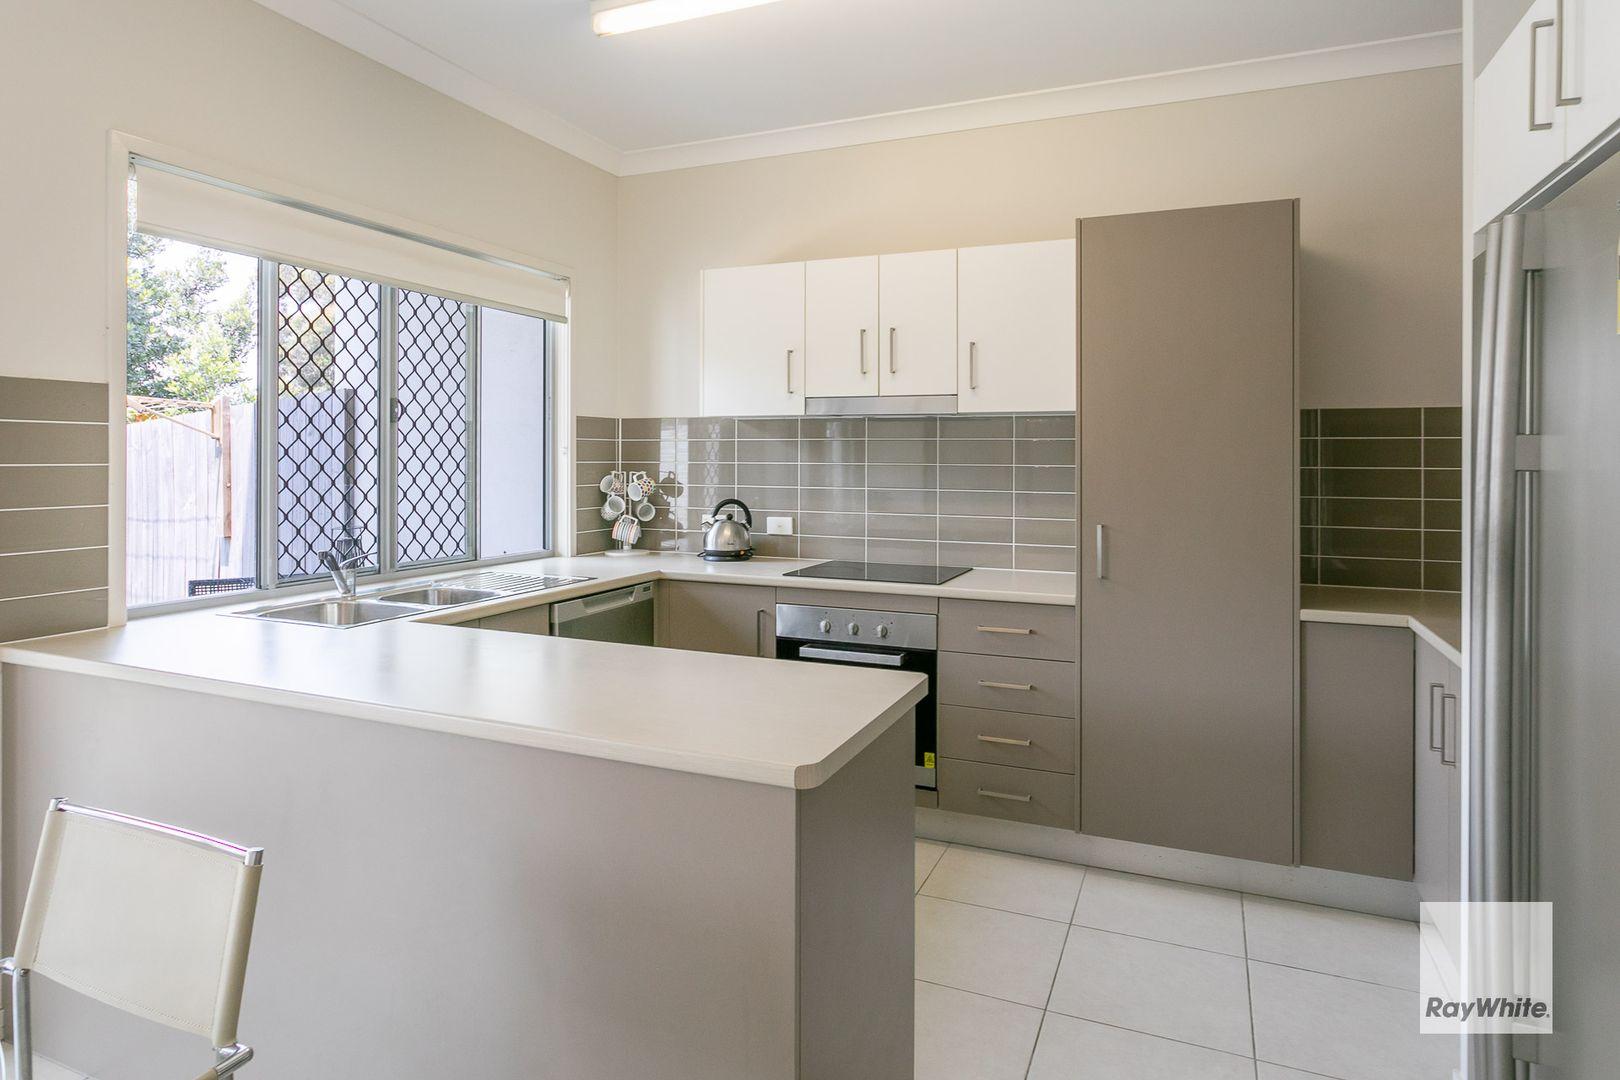 3/62-64 Valantine Road, Birkdale QLD 4159, Image 1